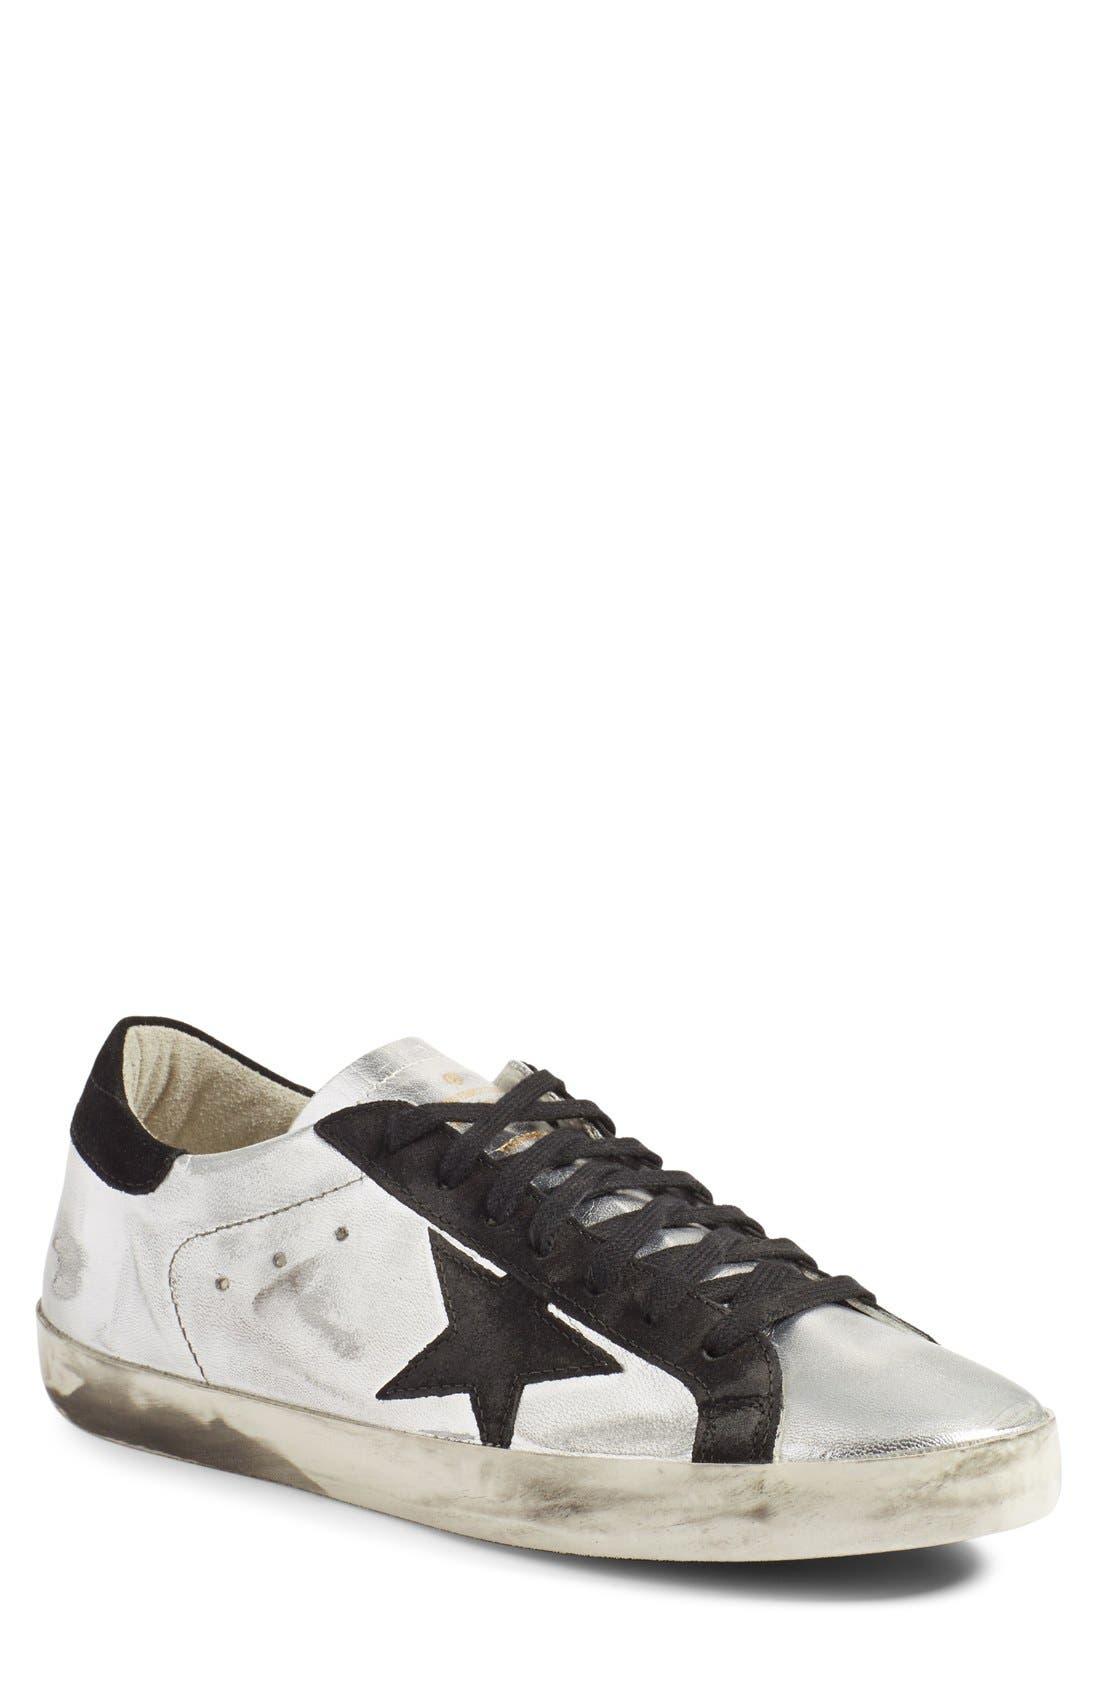 ,                             'Superstar' Sneaker,                             Main thumbnail 103, color,                             040